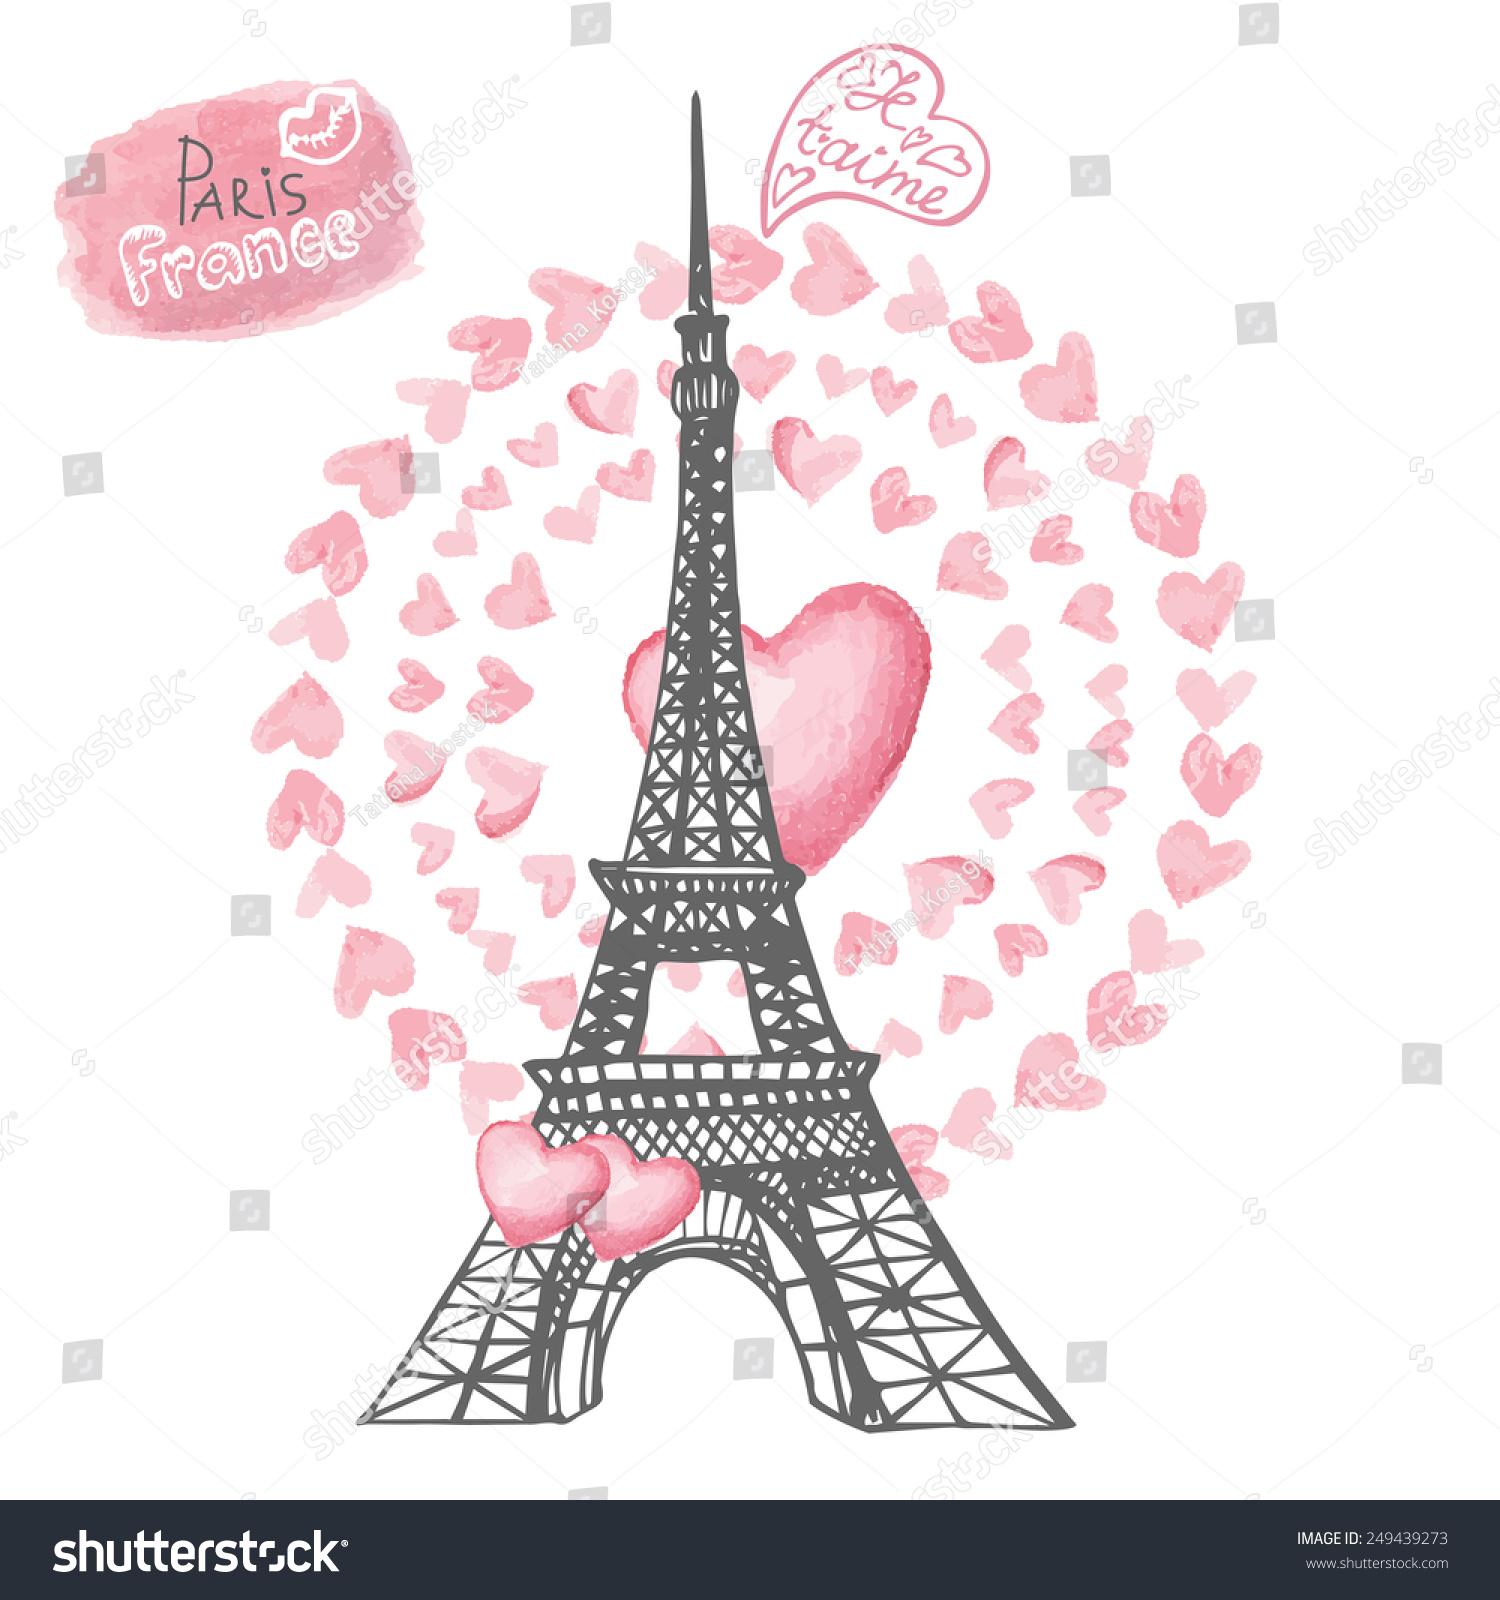 As Creation Pink Paris Pattern Eiffel Tower Childrens: Love Pariscard Eiffel Towerletteringpink Hearts Wreathhand